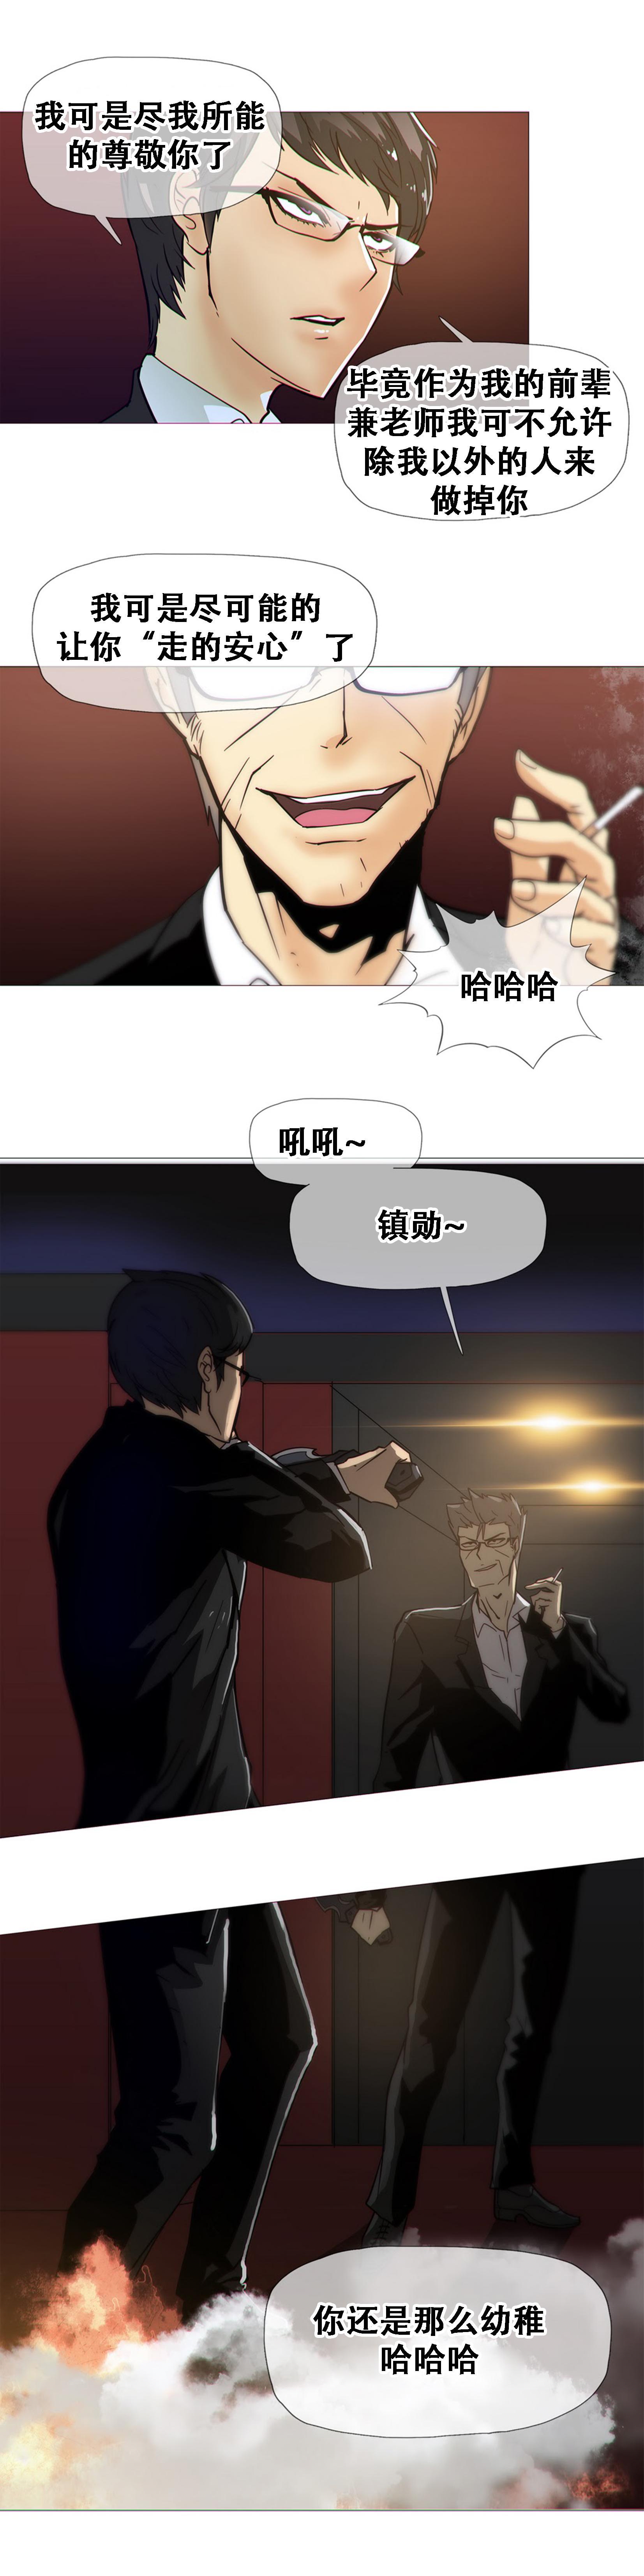 HouseHold Affairs 【卞赤鲤个人汉化】1~21话(持续更新中) 360